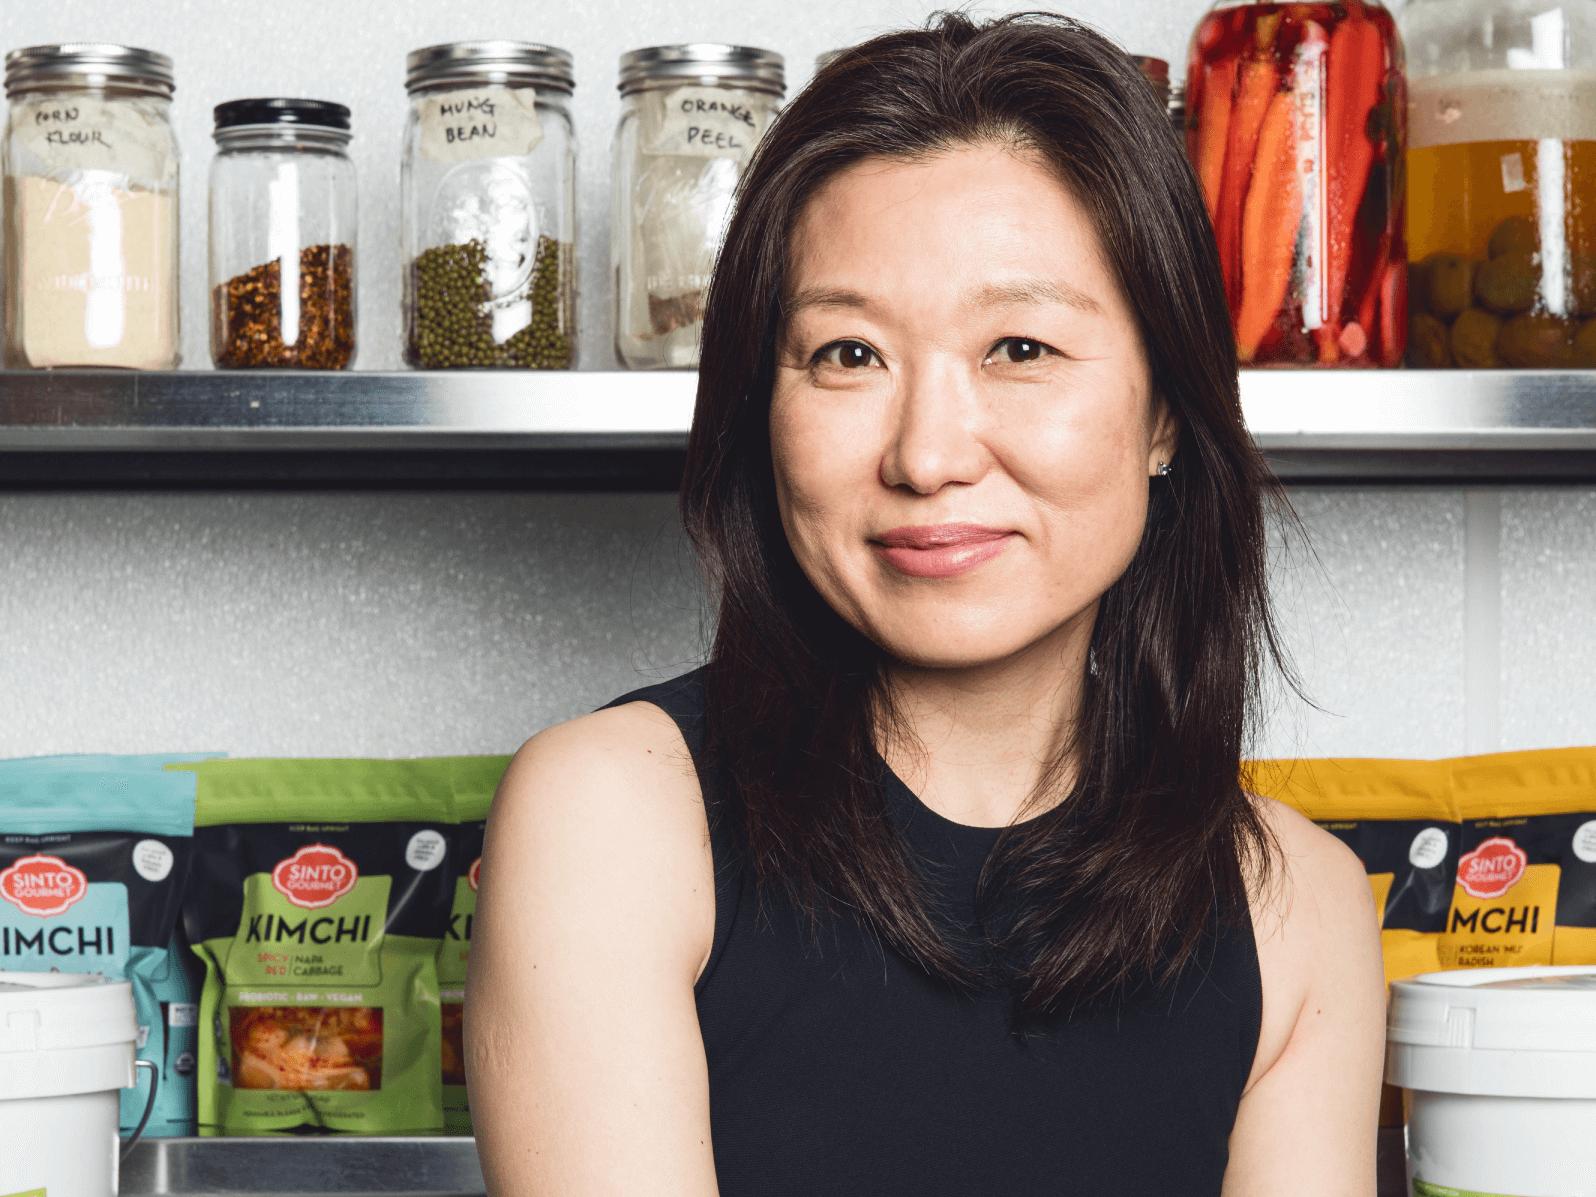 Sinto Kimchi founder, Chef HyunJoo